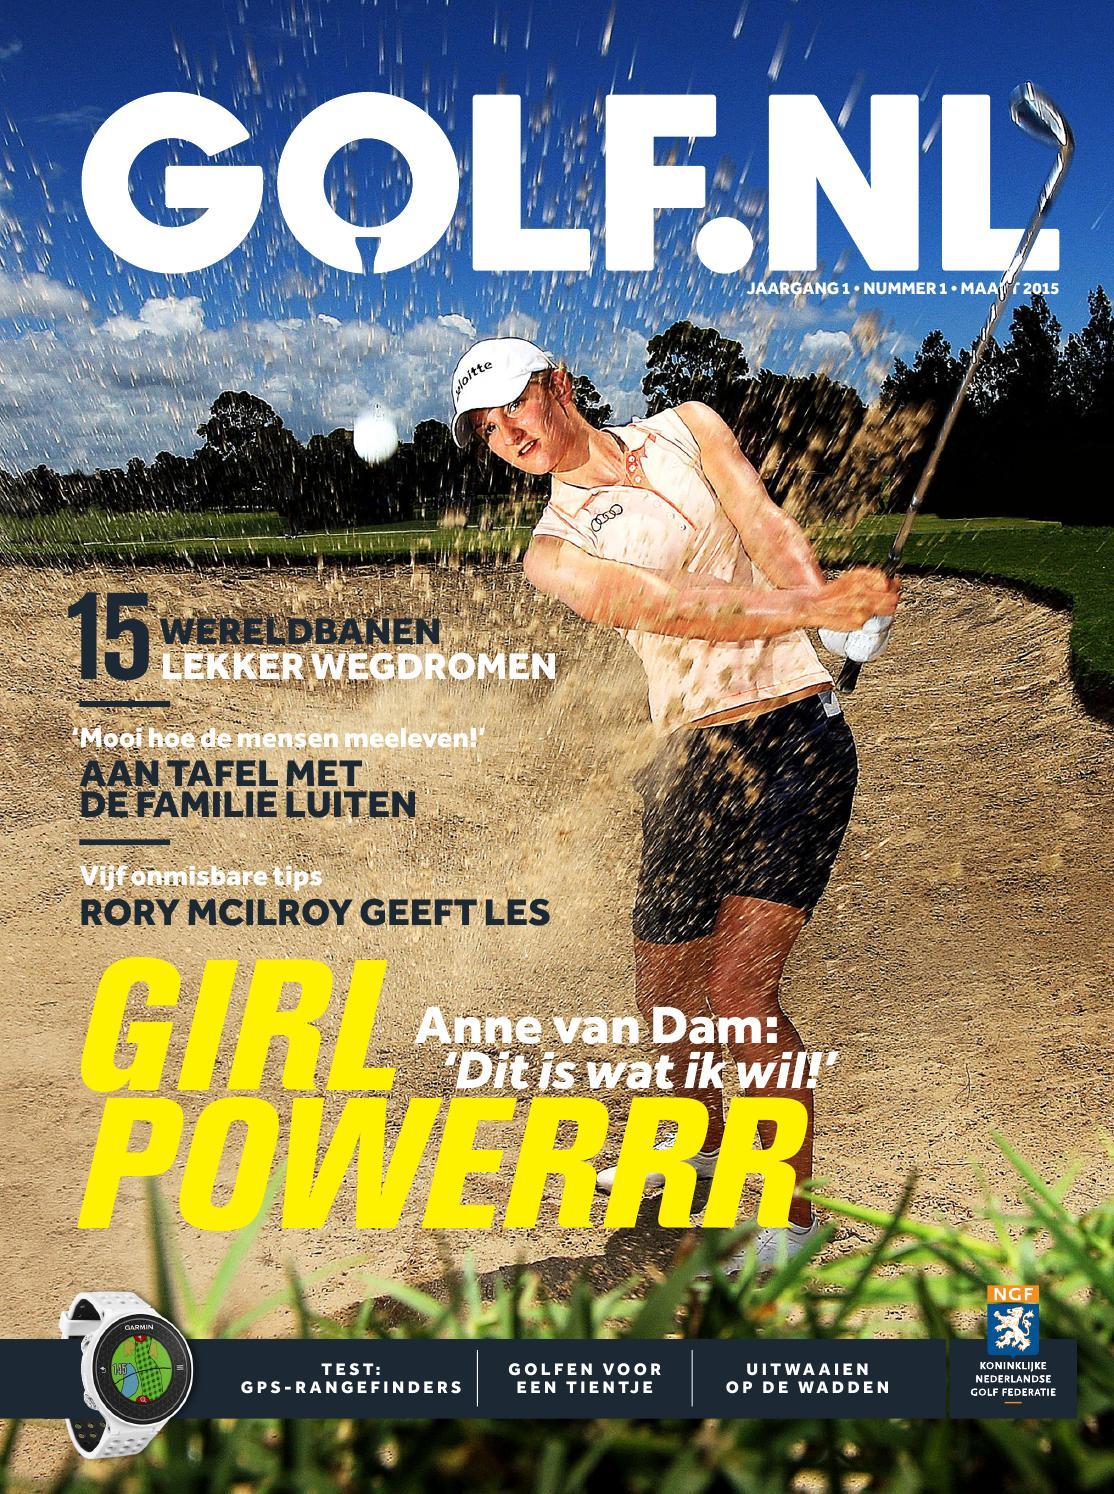 Golf.nl weekly 25 by koninklijke nederlandse golf federatie   issuu